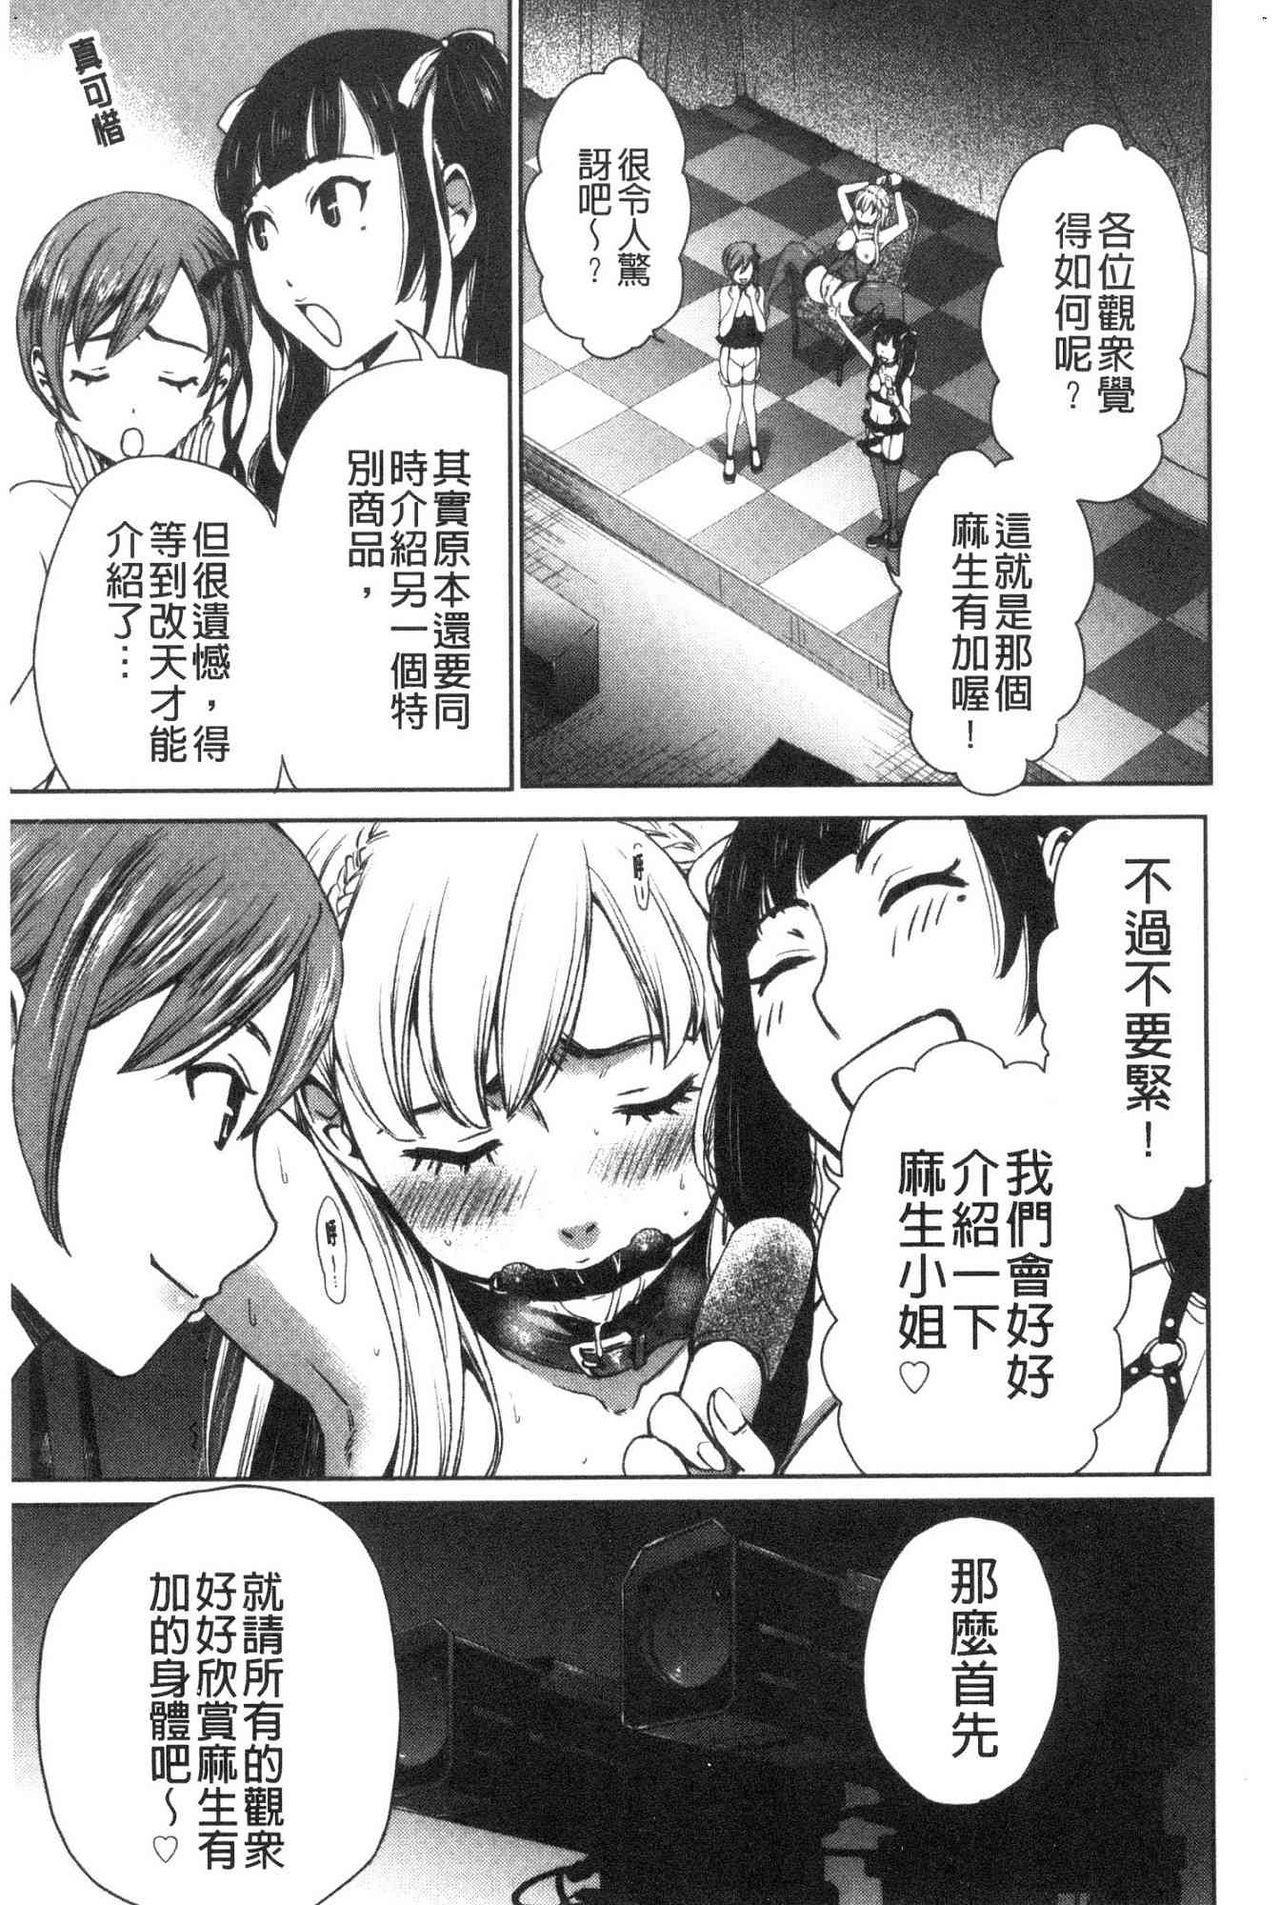 [Gotoh Akira]  21-ji no Onna ~Camera no Mae no Mesuinu~ 2 | 21時之女 ~鏡頭前的牝犬~ 2 [Chinese] 118